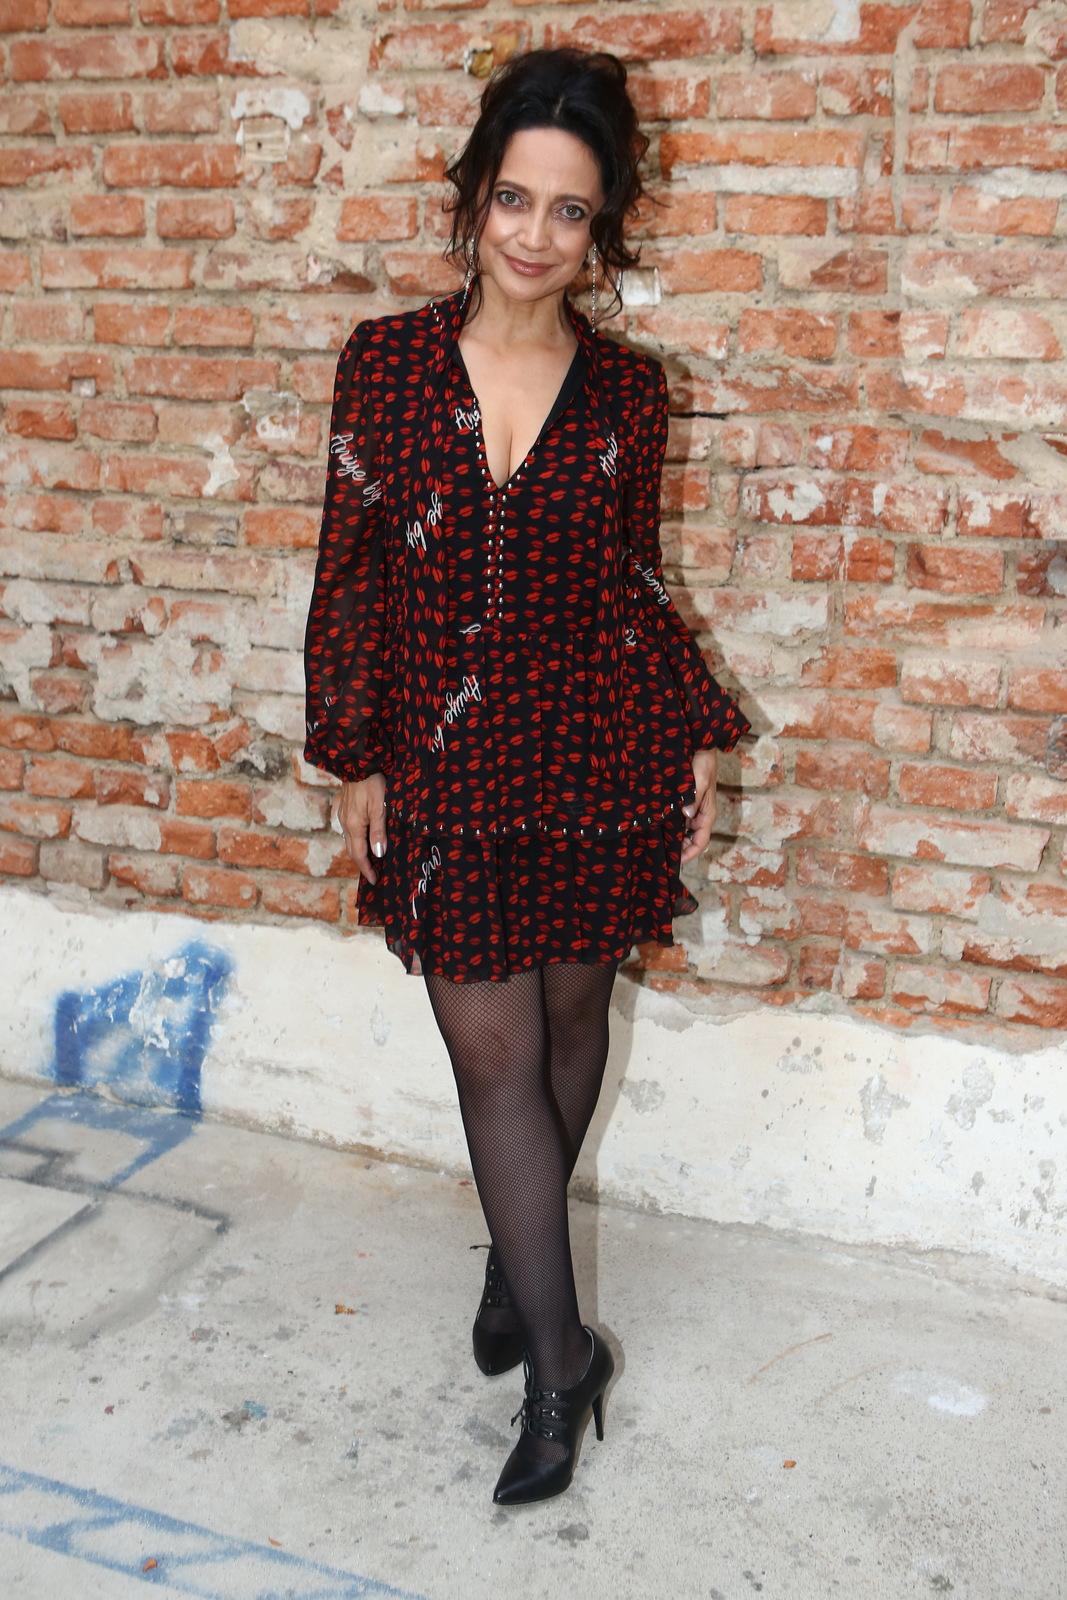 Lucie Bílá křtila své nové album Ta o mně